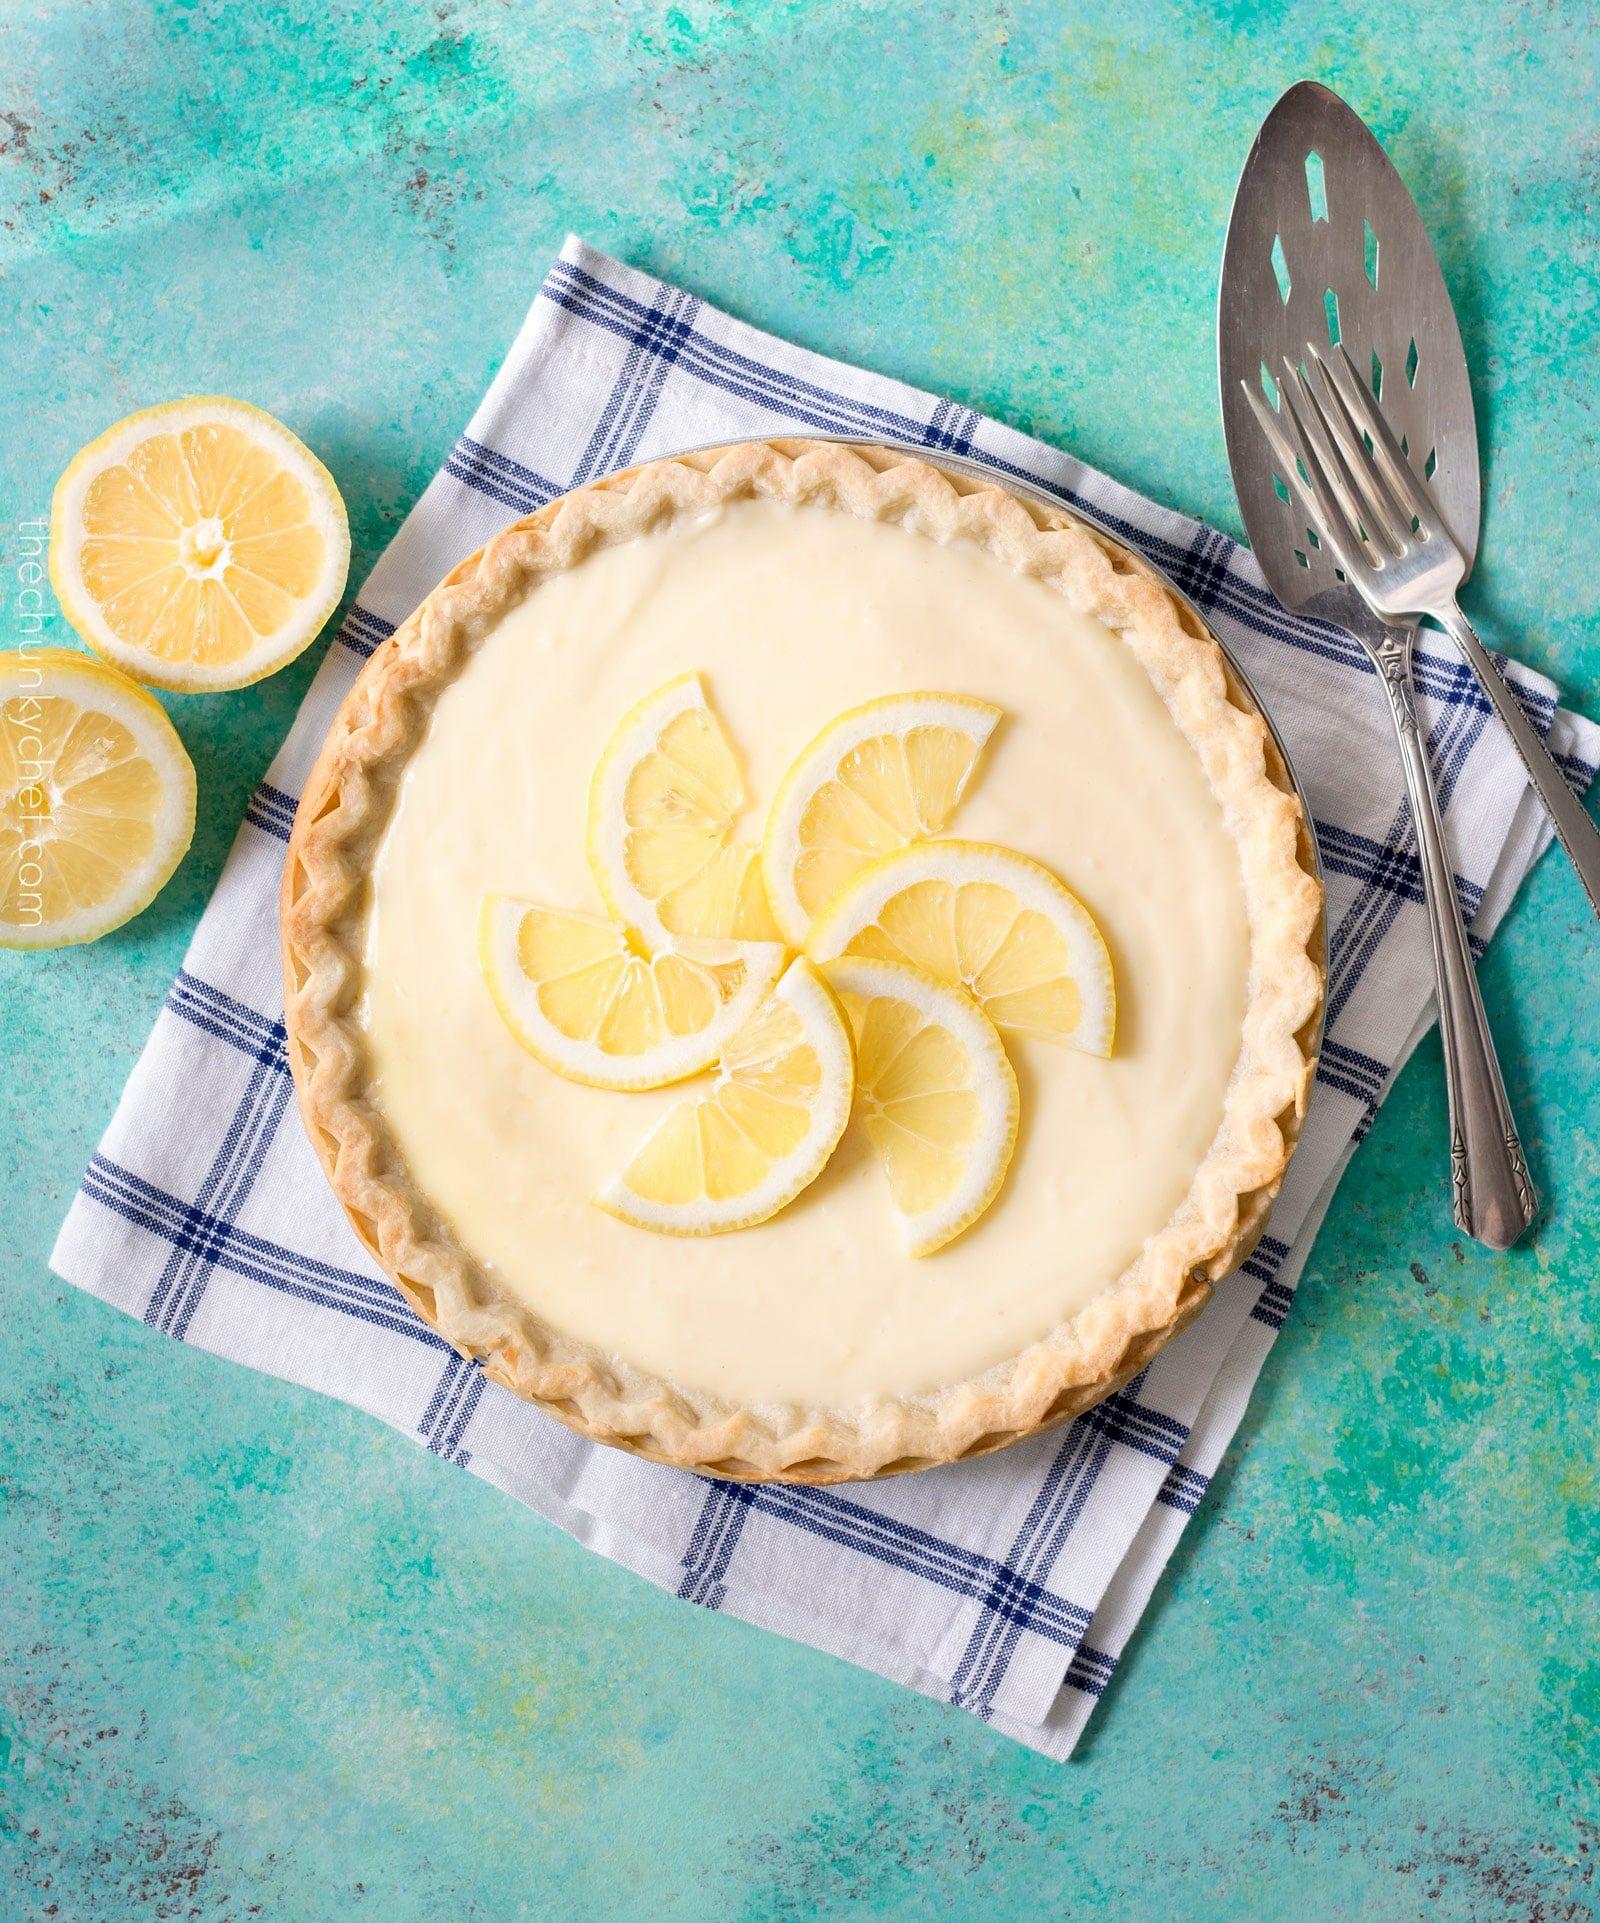 Creamy Sour Cream Lemon Pie This Almost No Bake Pie Is Cool Creamy Rich And Bursting With Summer Lemon Flavo Sweets Recipes Lemon Pie Lemon Sour Cream Pie